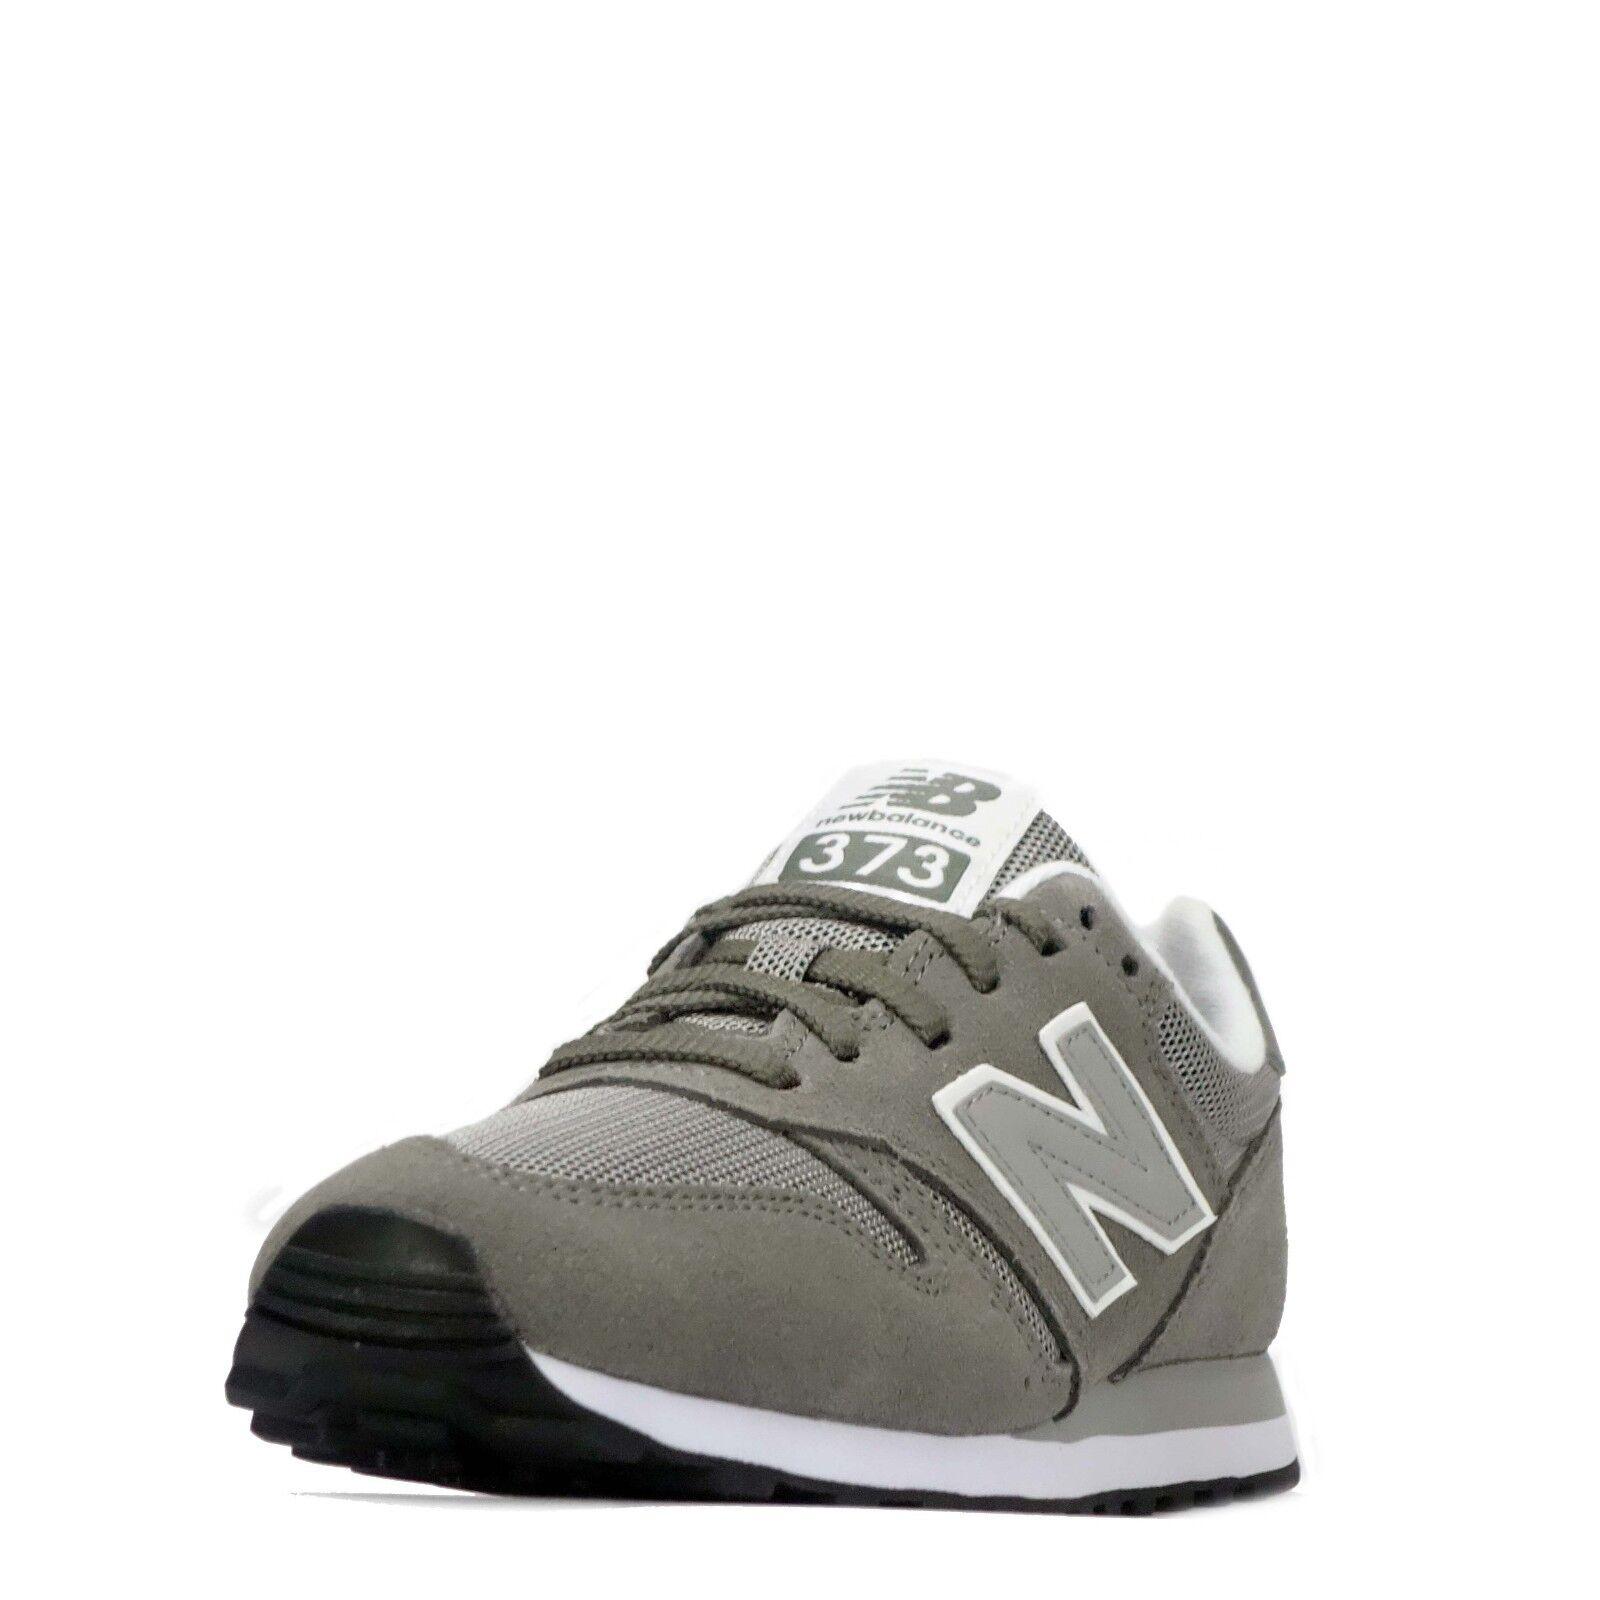 373 Balance 83322c Chaussures New Homme Grisesblanc 3RqA5jcLS4